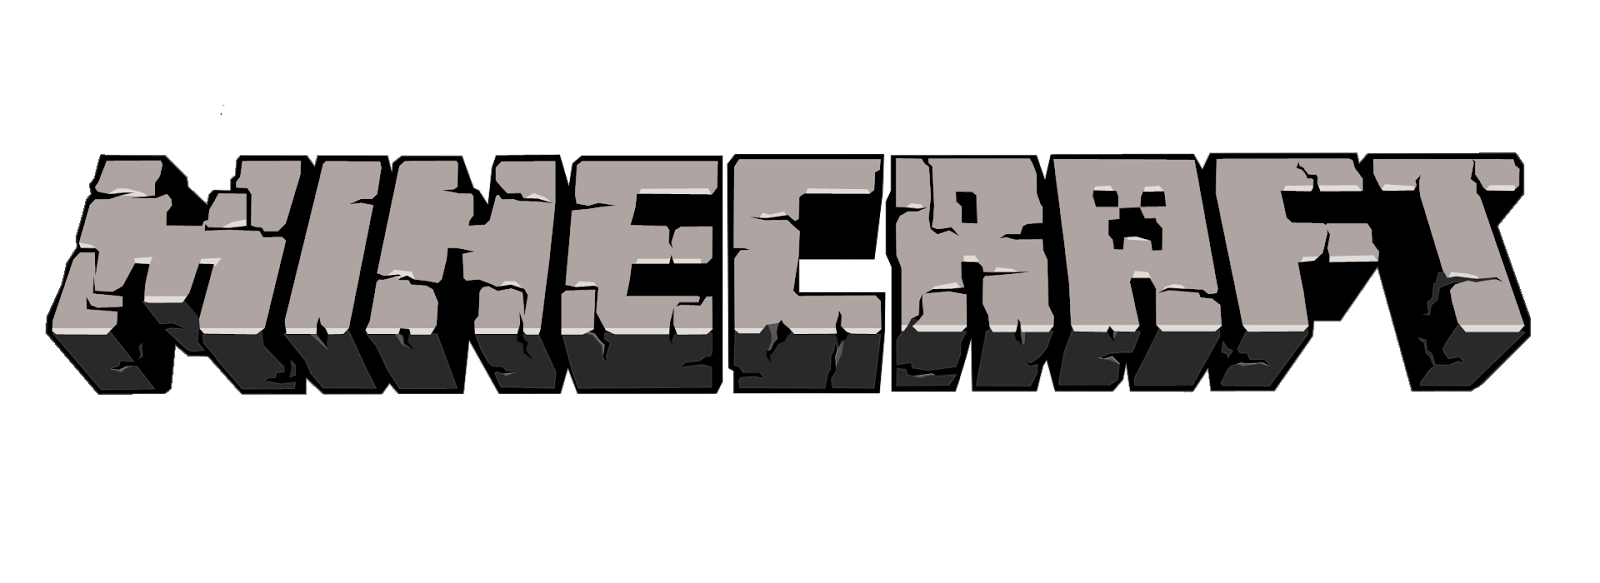 Free Minecraft Cliparts, Download Free Clip Art, Free Clip.